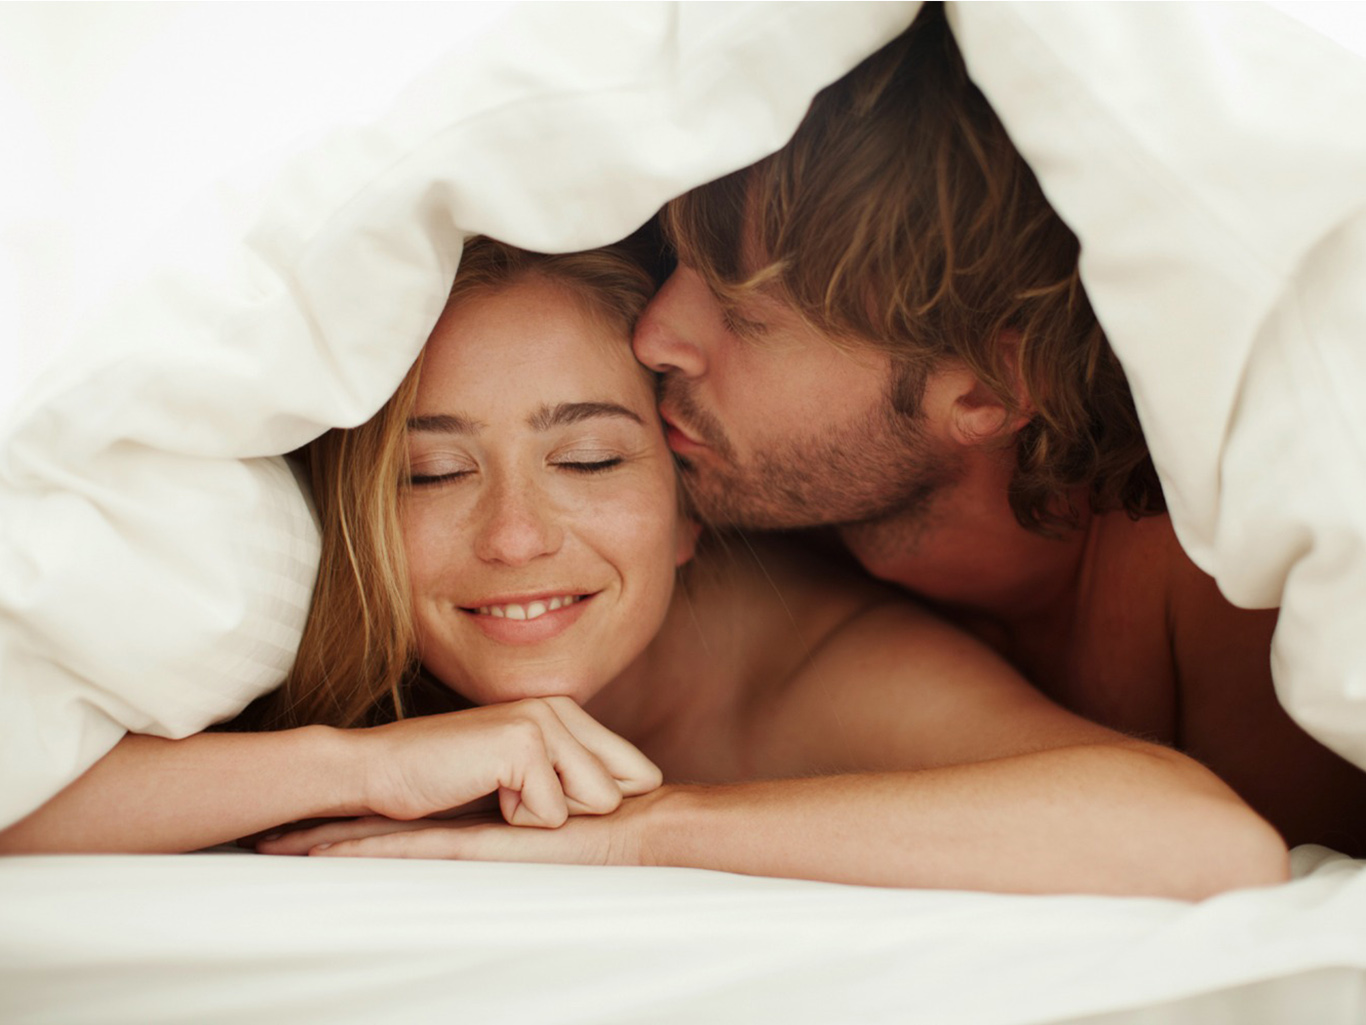 Секс надоедает